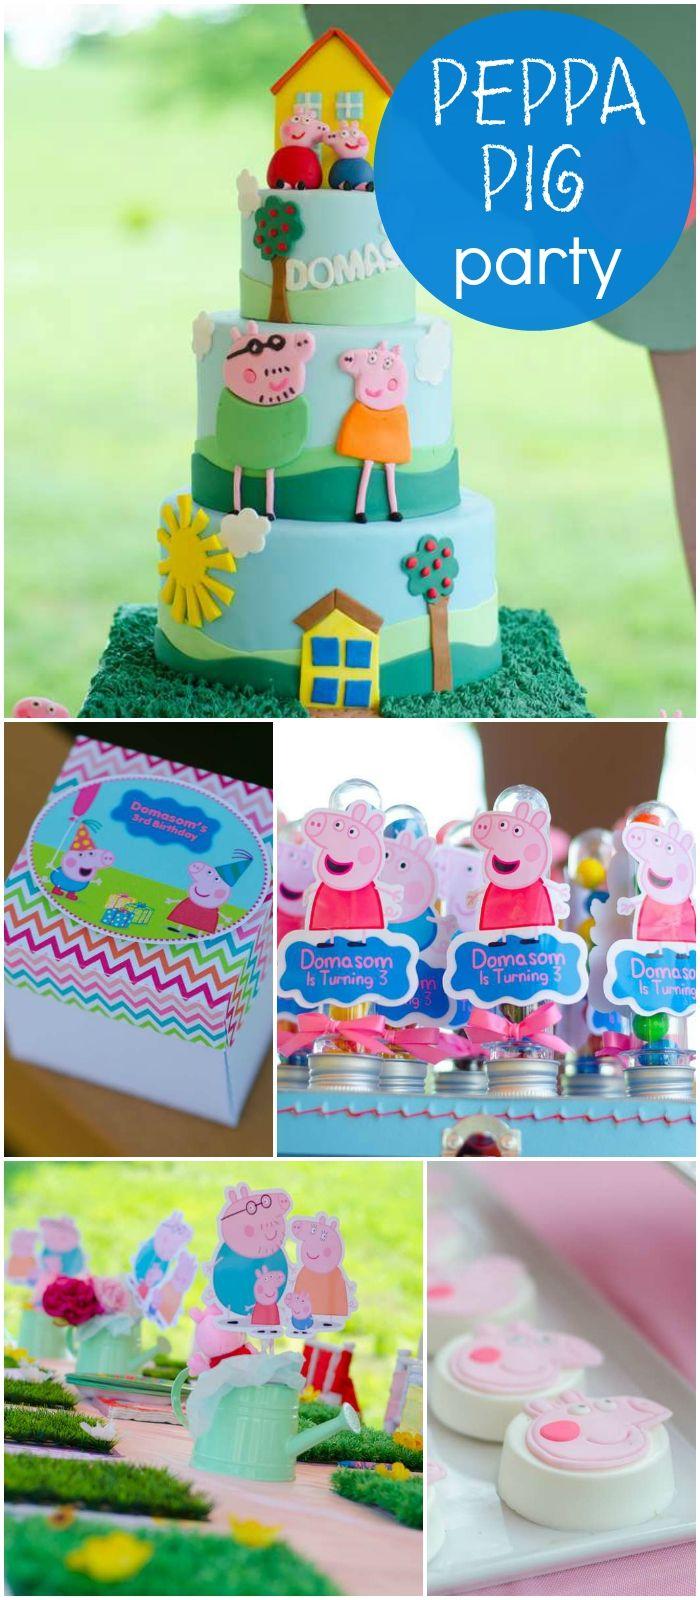 Peppa Pig Themed Party Birthday Domasom S 3rd Peppa Pig Birthday Catch My Party Peppa Pig Birthday Pig Birthday Peppa Pig Birthday Party